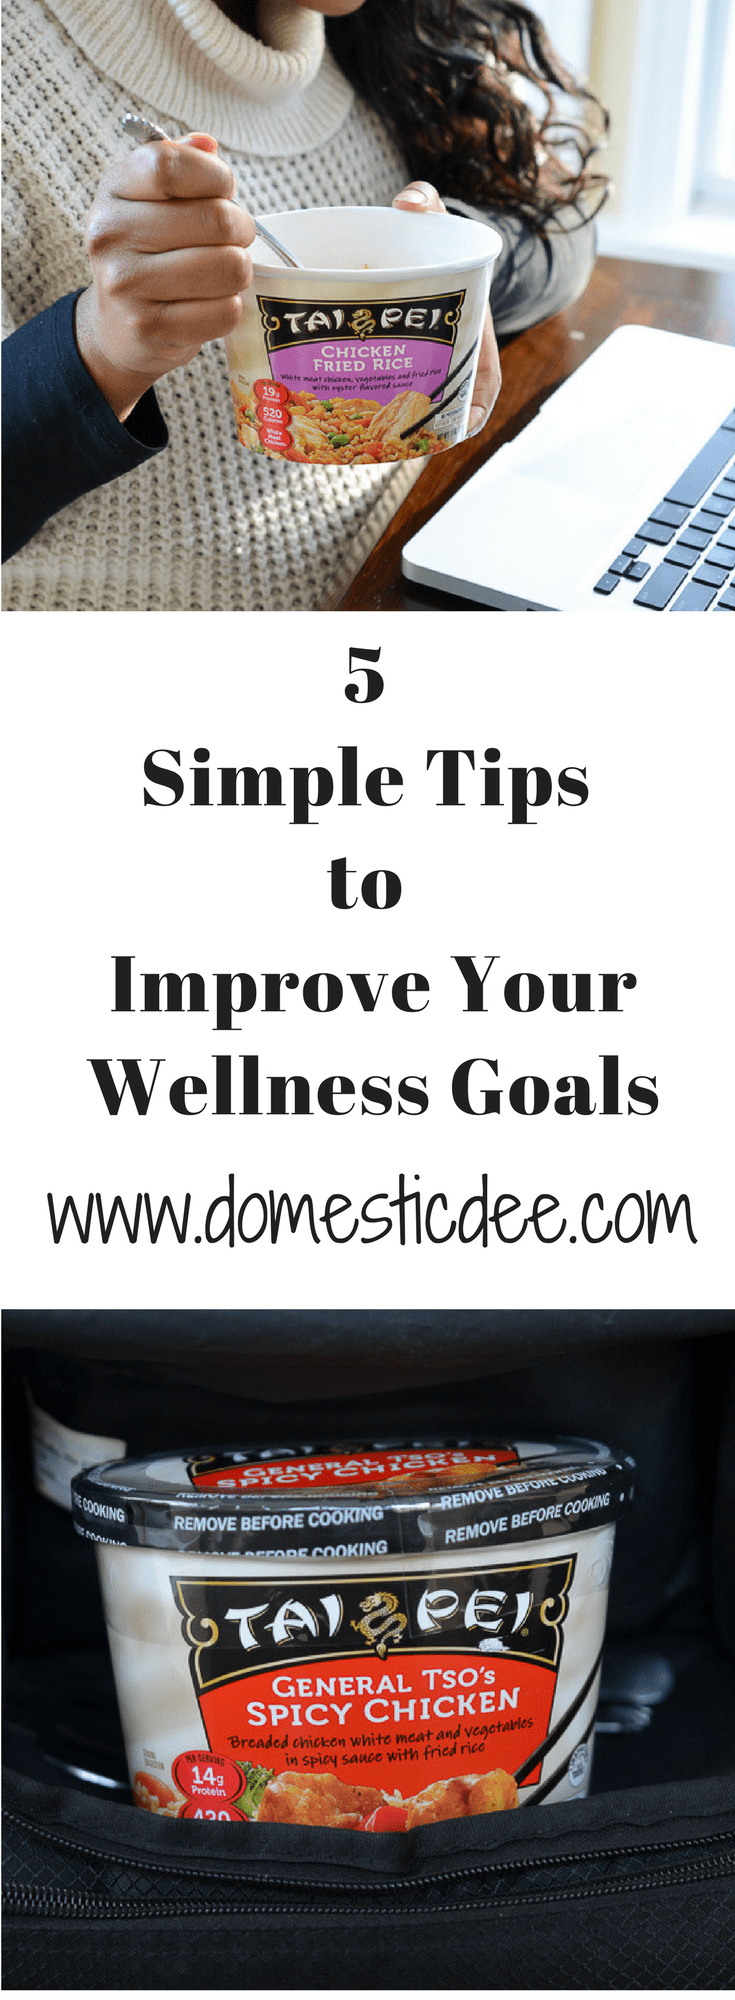 5 Simple Tips to Improve Your Wellness Goals domesticdee.com #wellnessgoals #asianfood